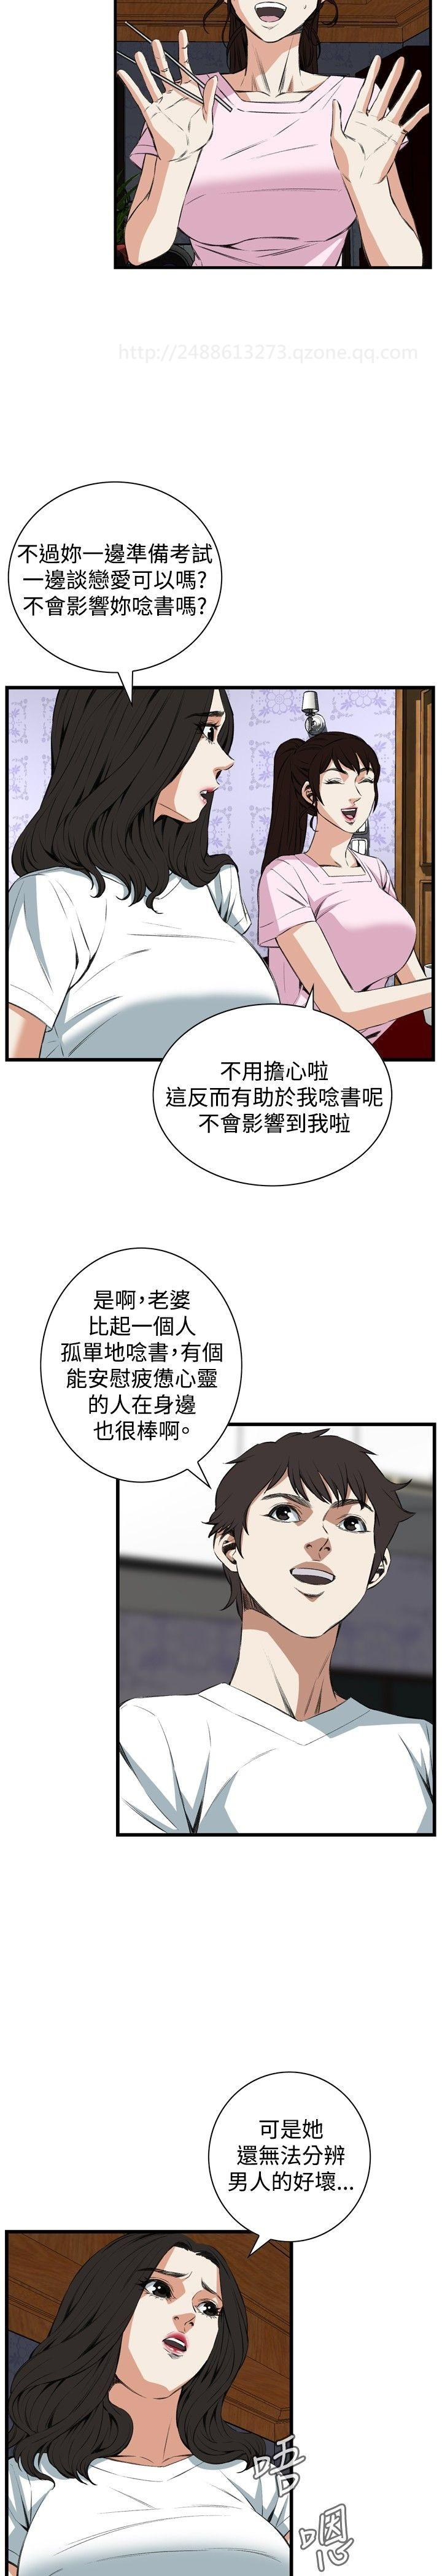 Take a Peek 偷窥 Ch.39~55 [Chinese]中文 520